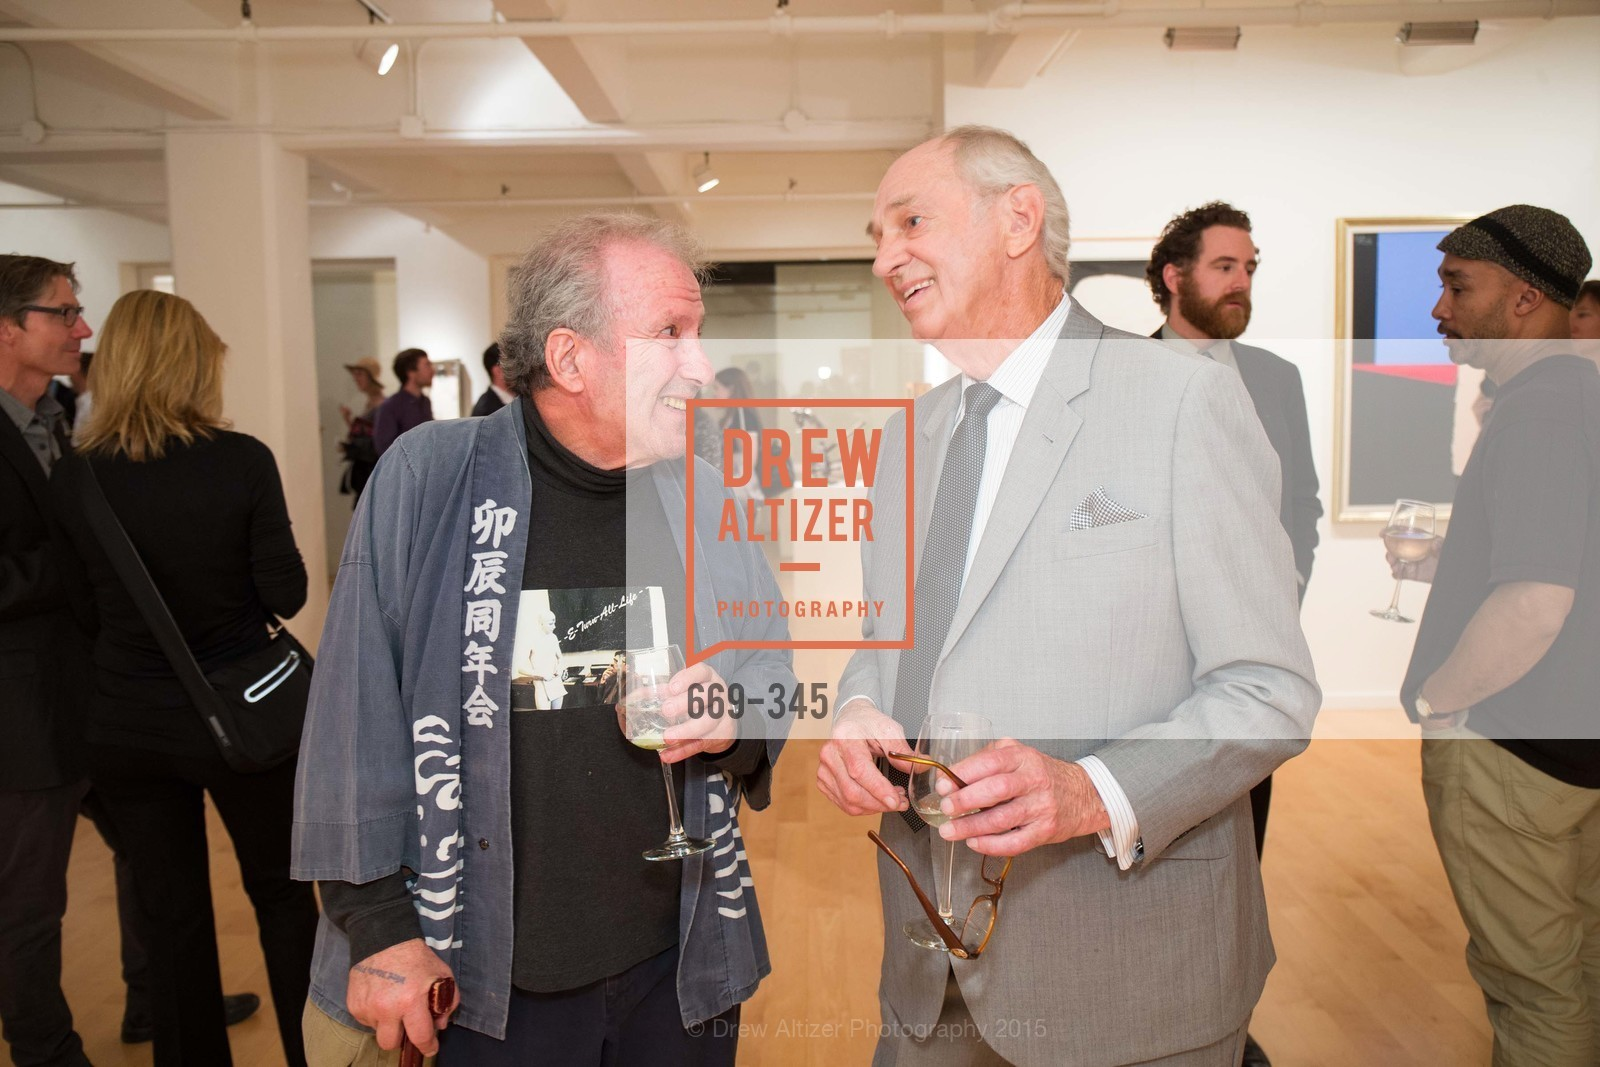 Michael Beck, John Berggruen Gallery presents